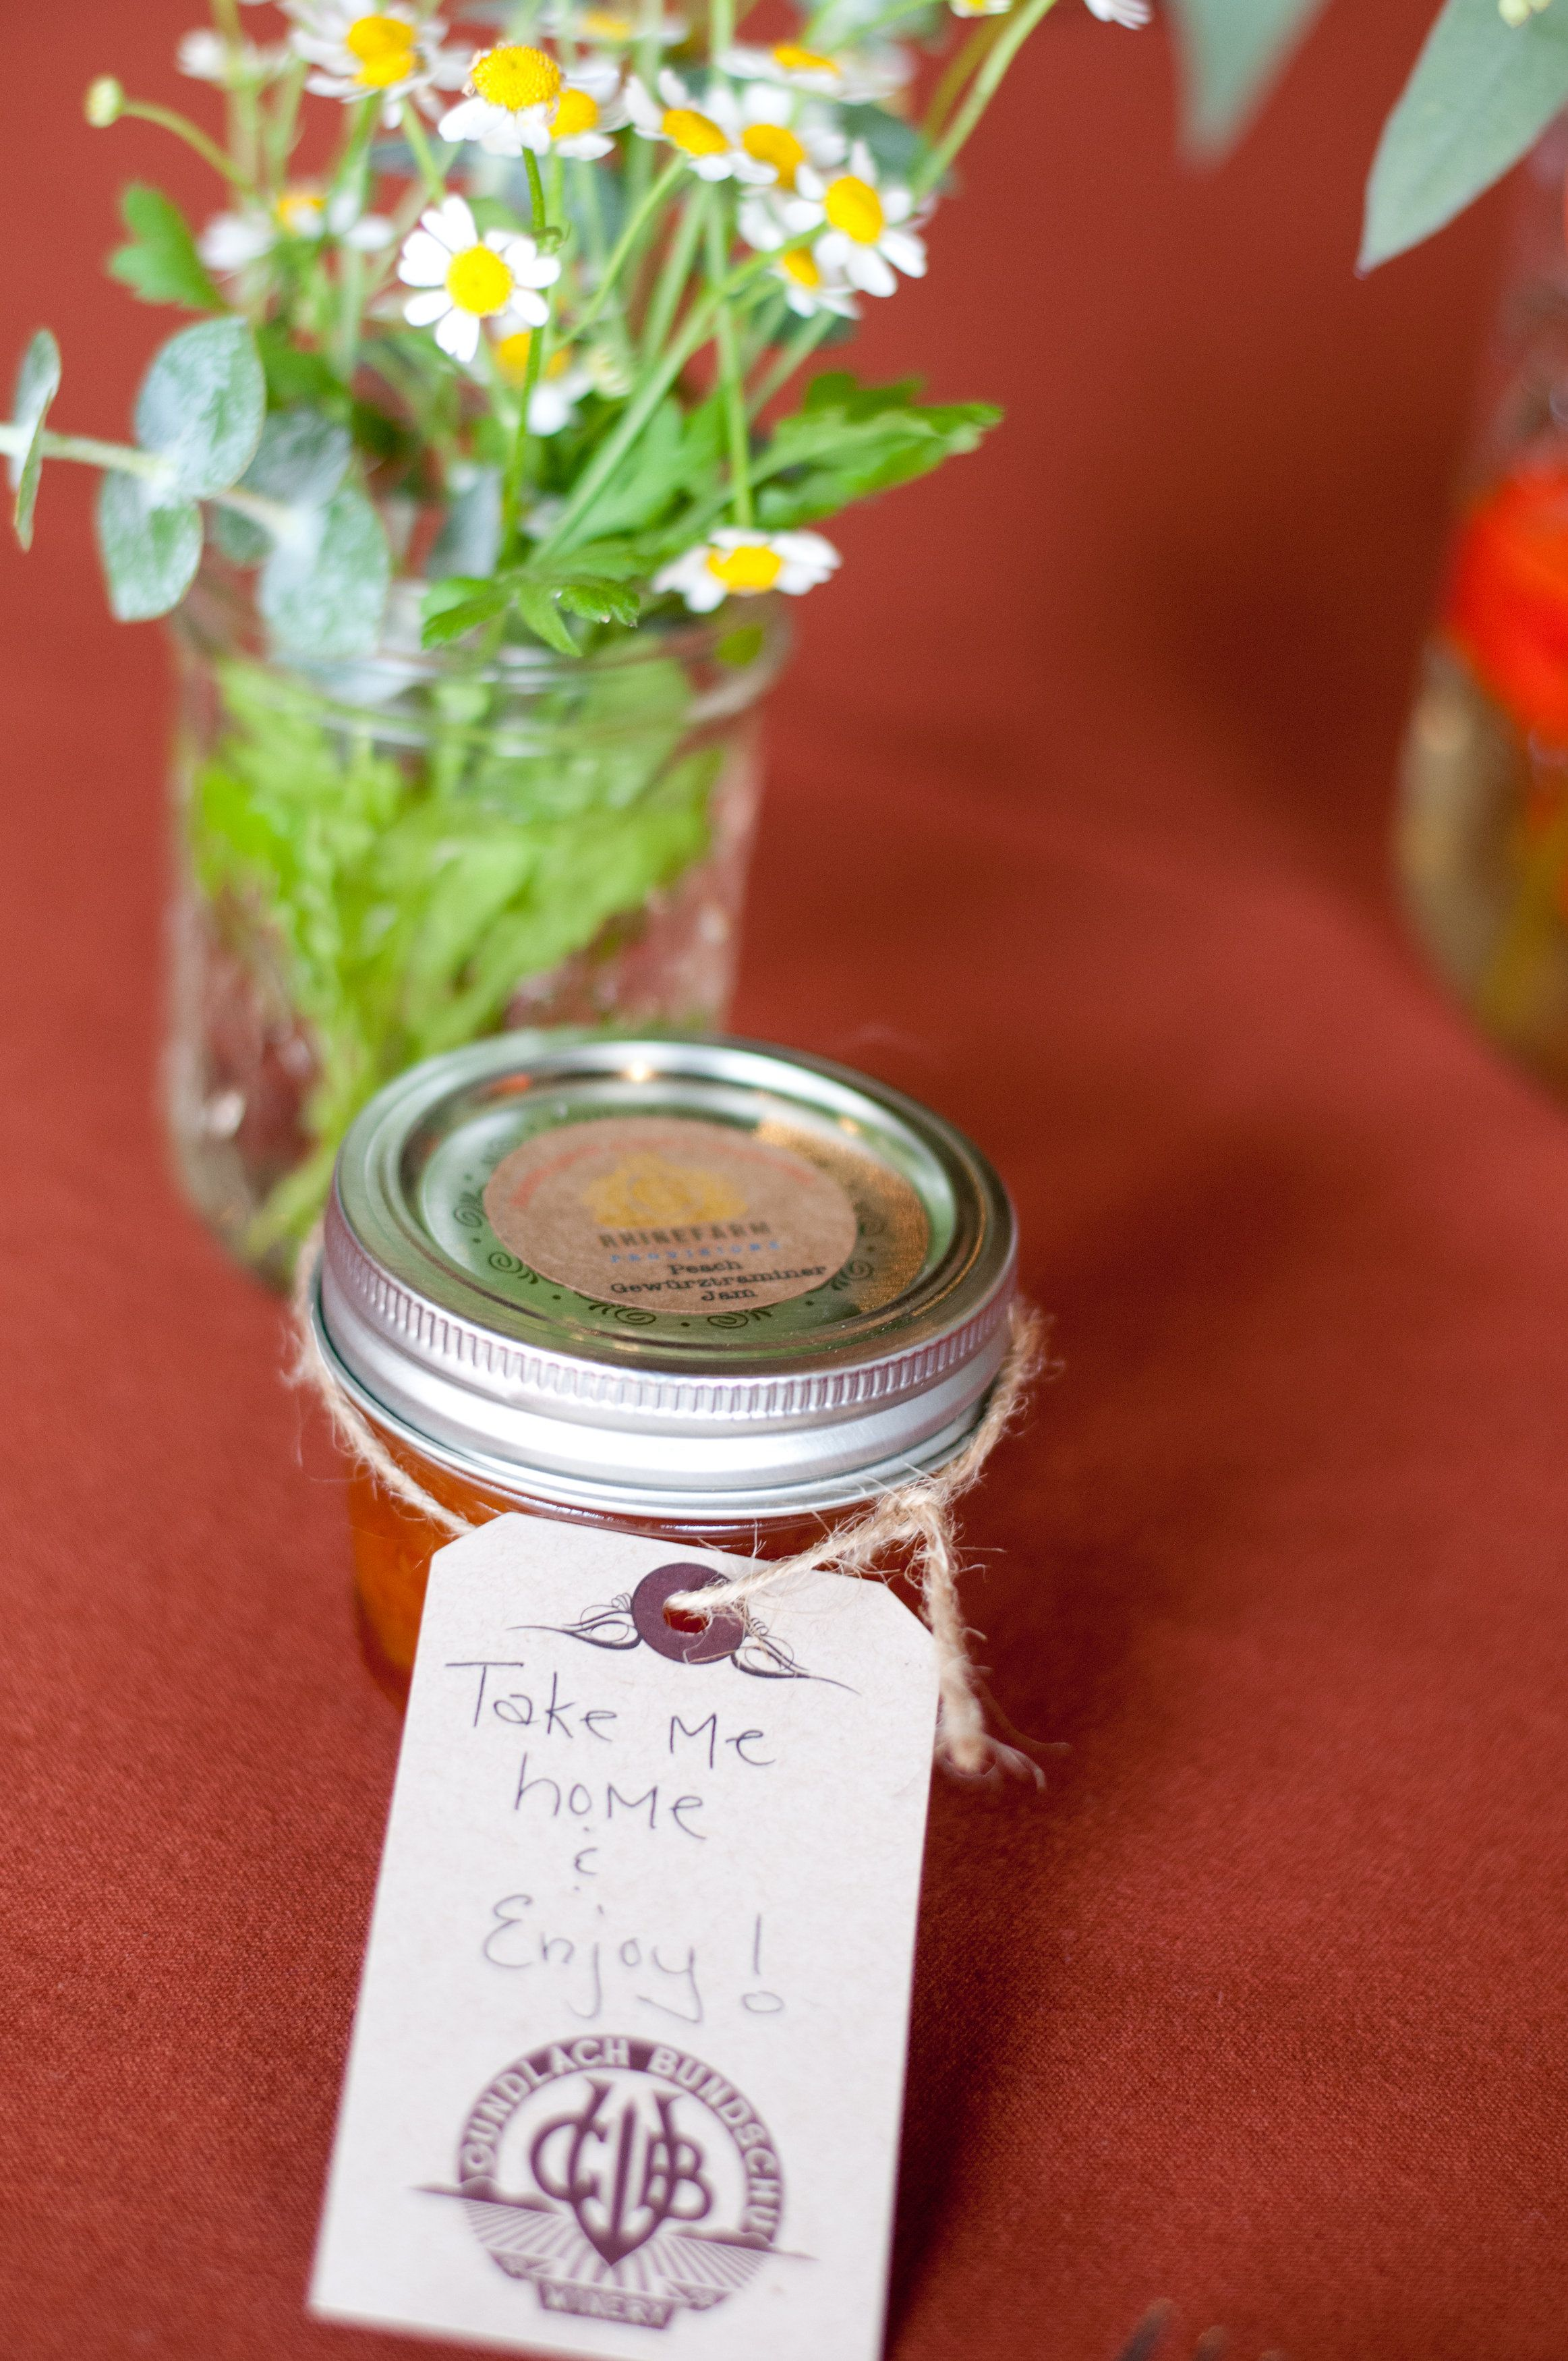 Homemade jam party favors by rhinefarm provisions